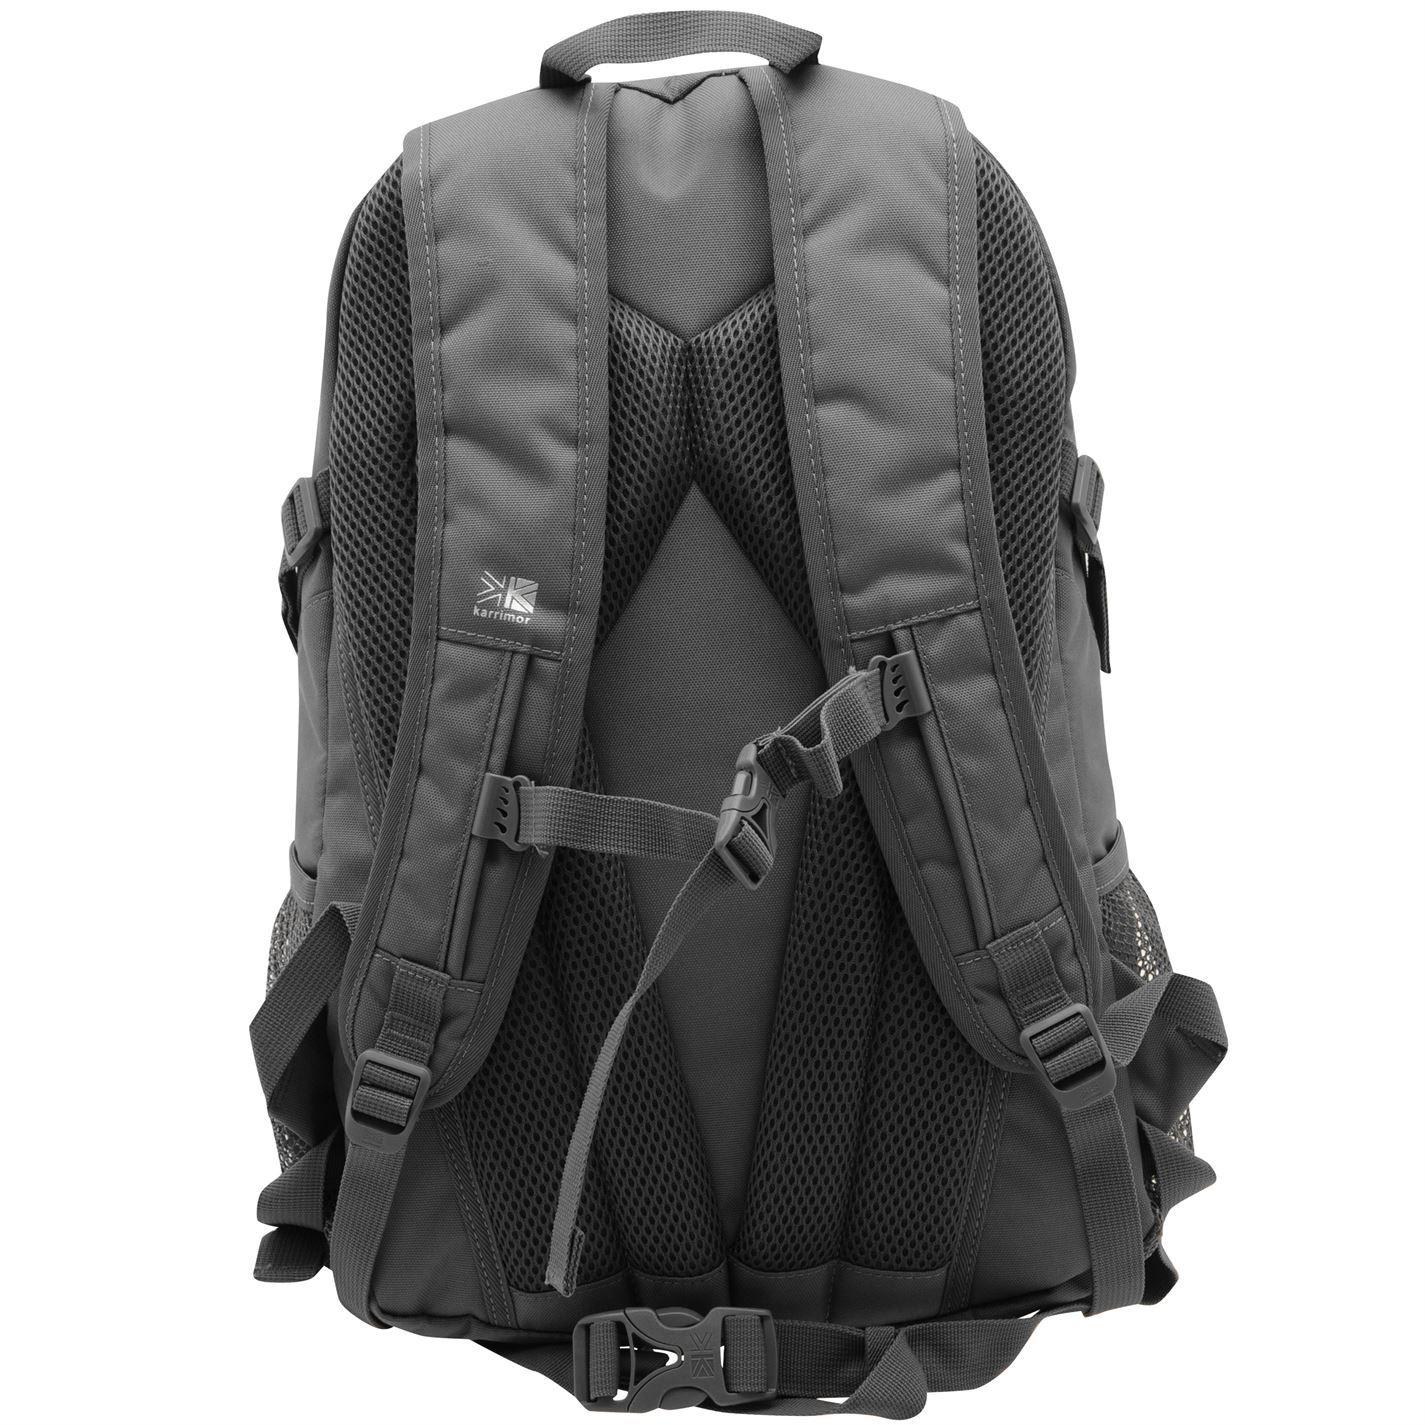 Karrimor Urban 30L Hiking Rucksack Backpack Bag Drawstring Reflective